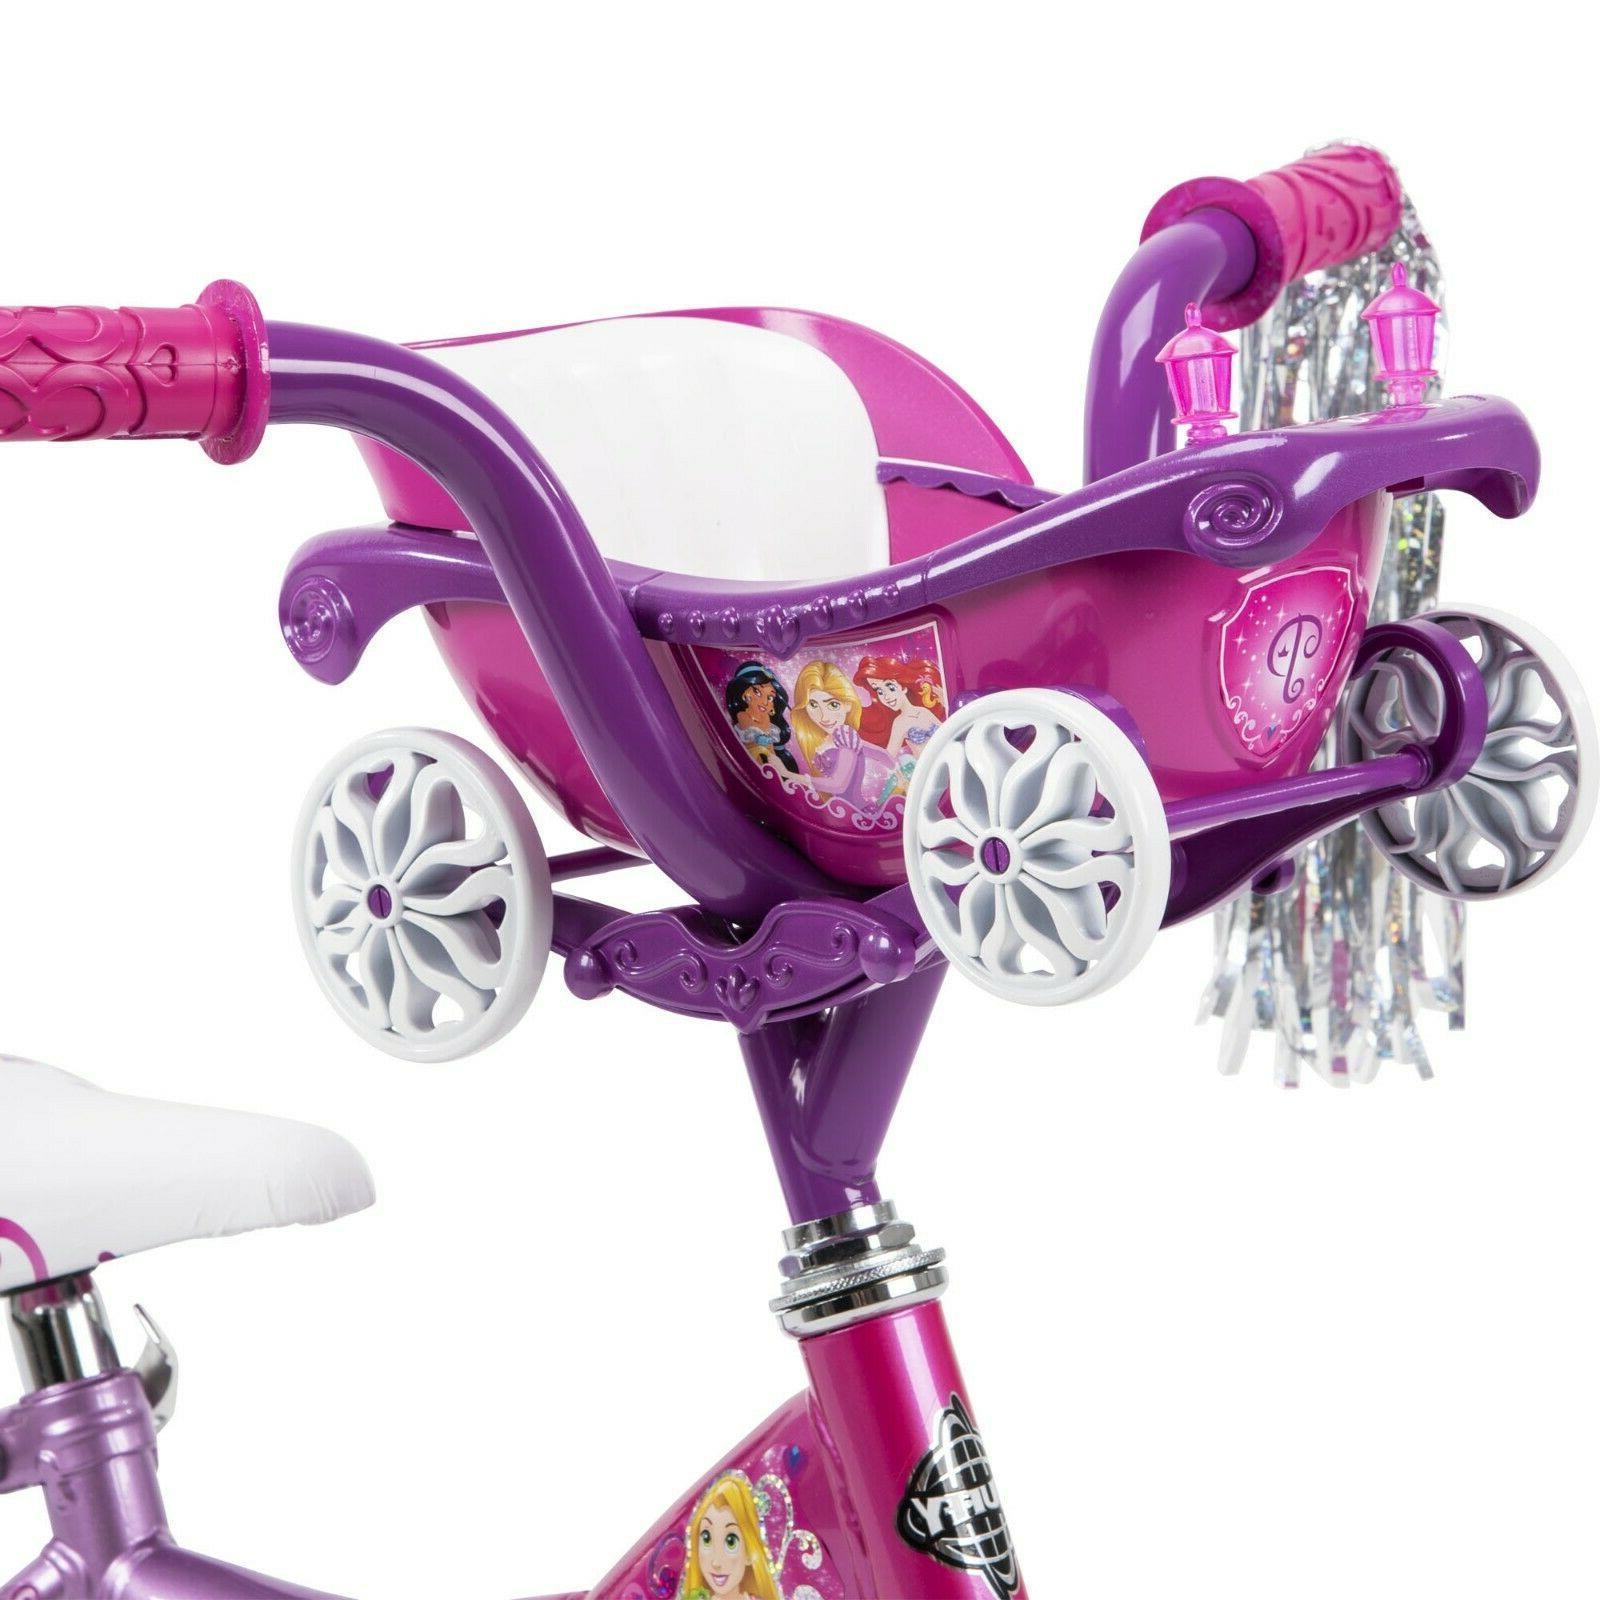 Huffy Kid's Bike with